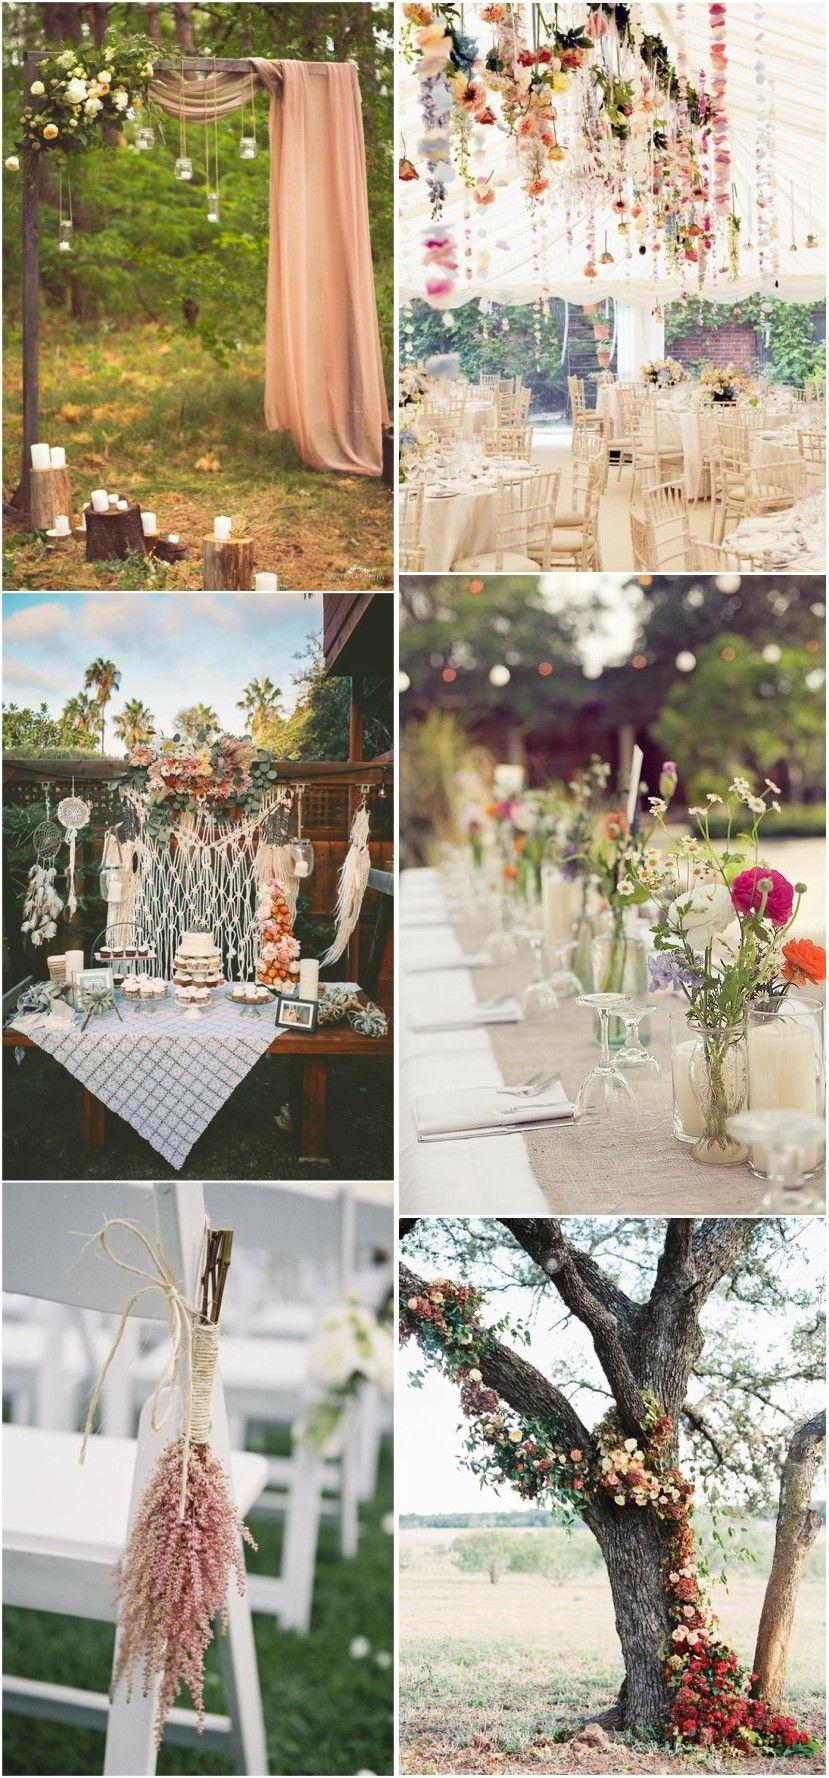 20 gorgeous boho wedding décor ideas on pinterest down the aisle